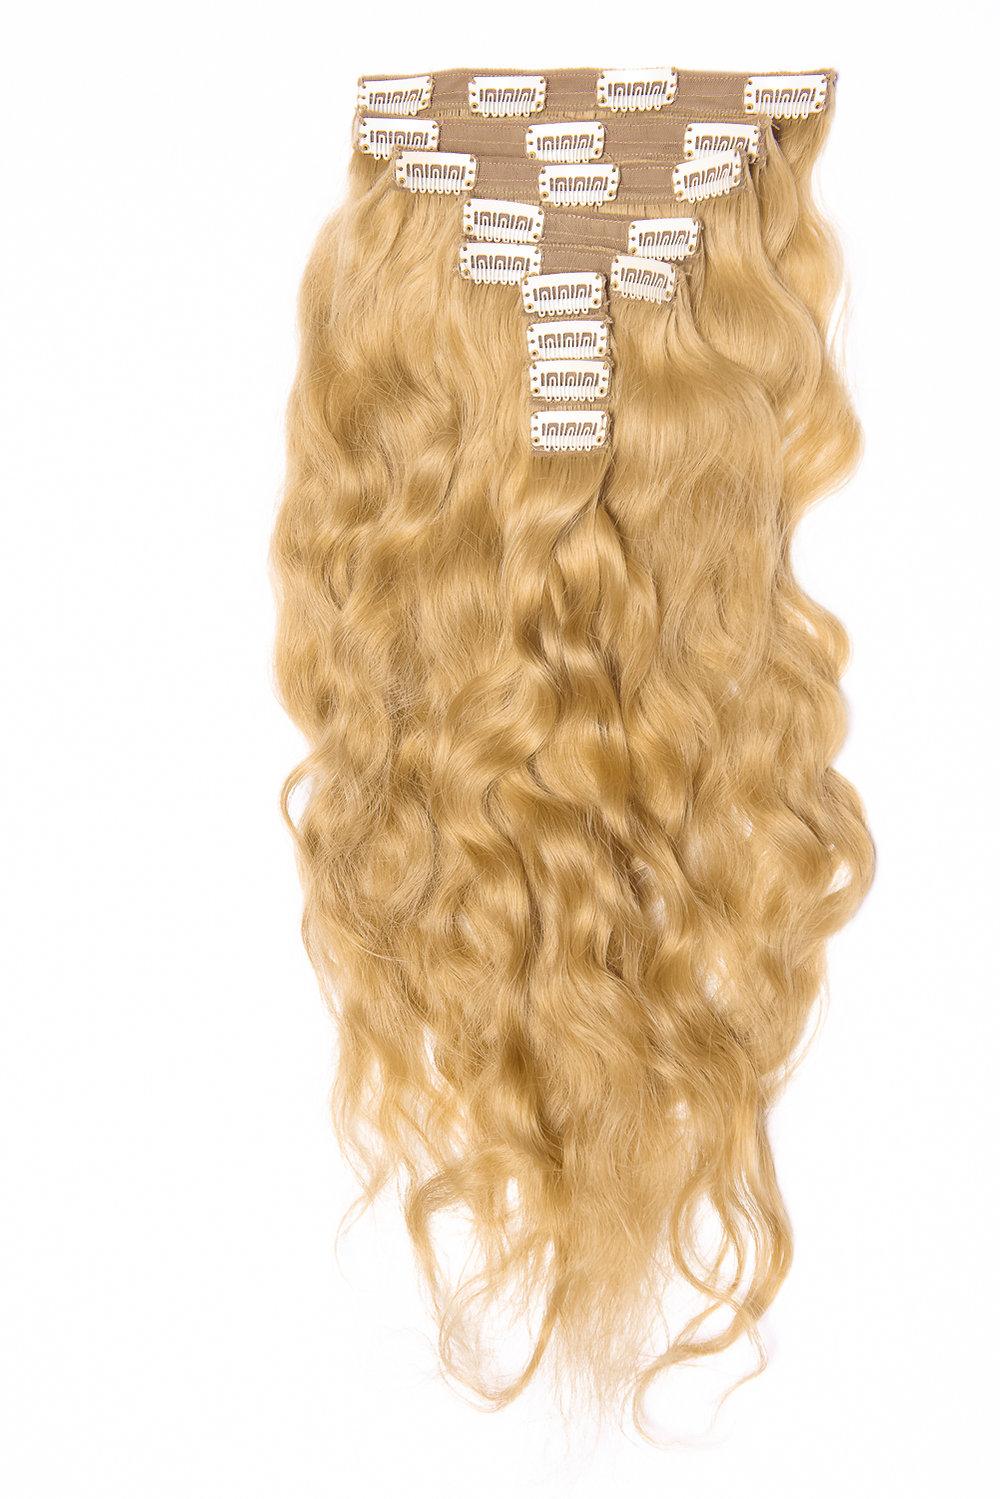 #24 Ash Blonde